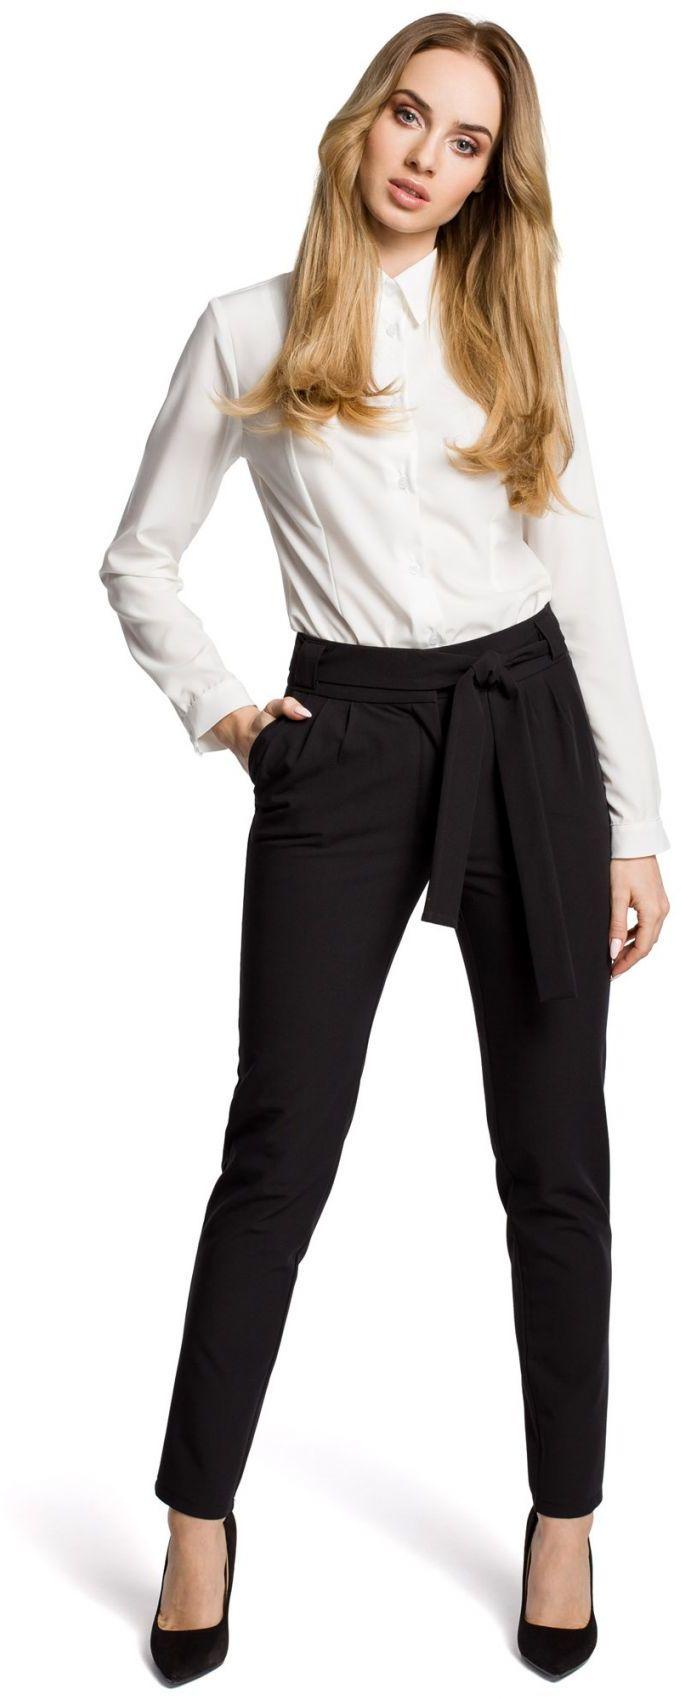 M363 Spodnie chino z paskiem czarne